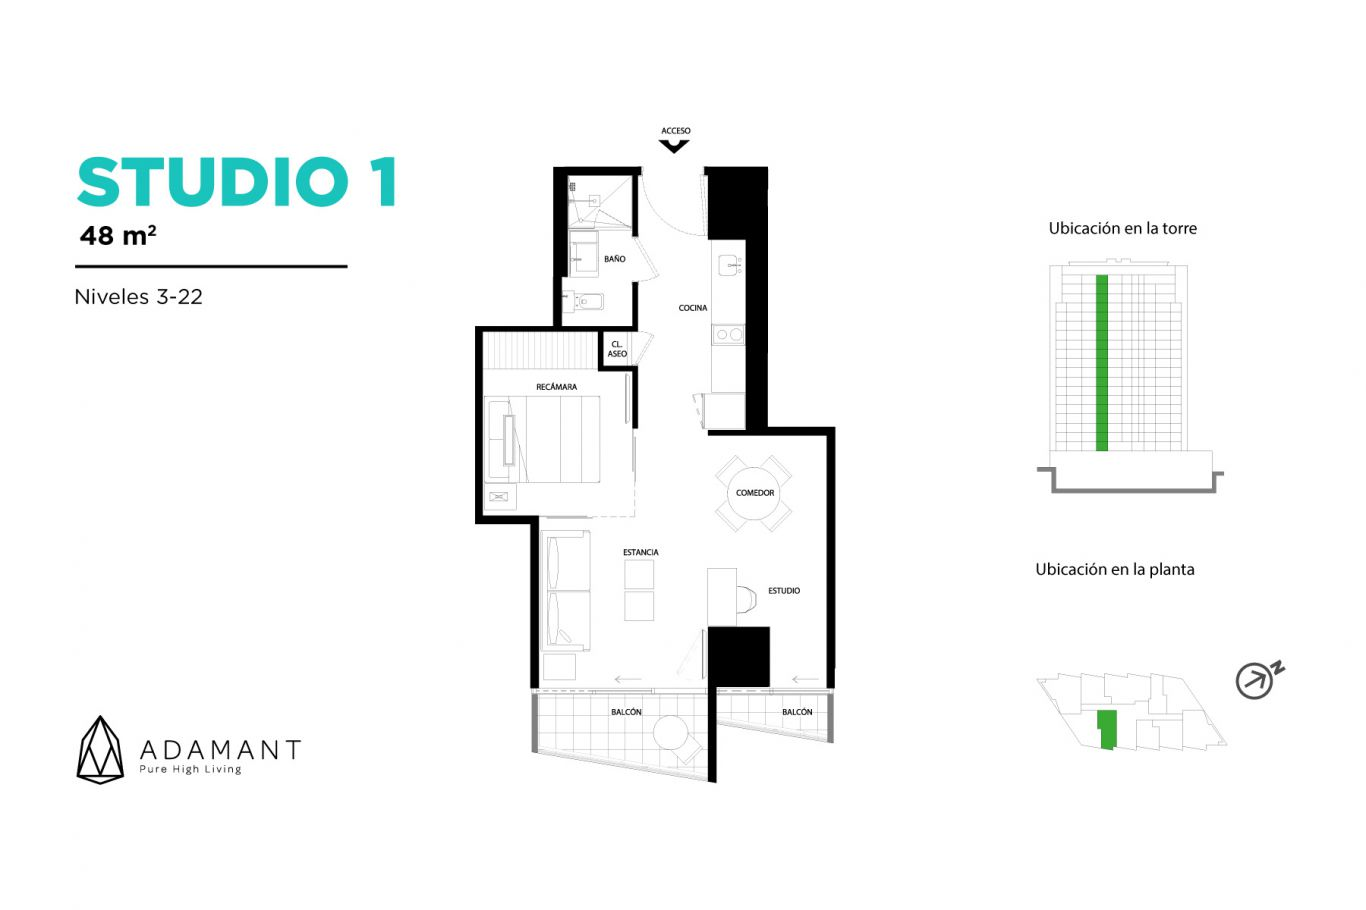 Adamant tijuana, id 1656034, no 1, plano de studio 1, 524